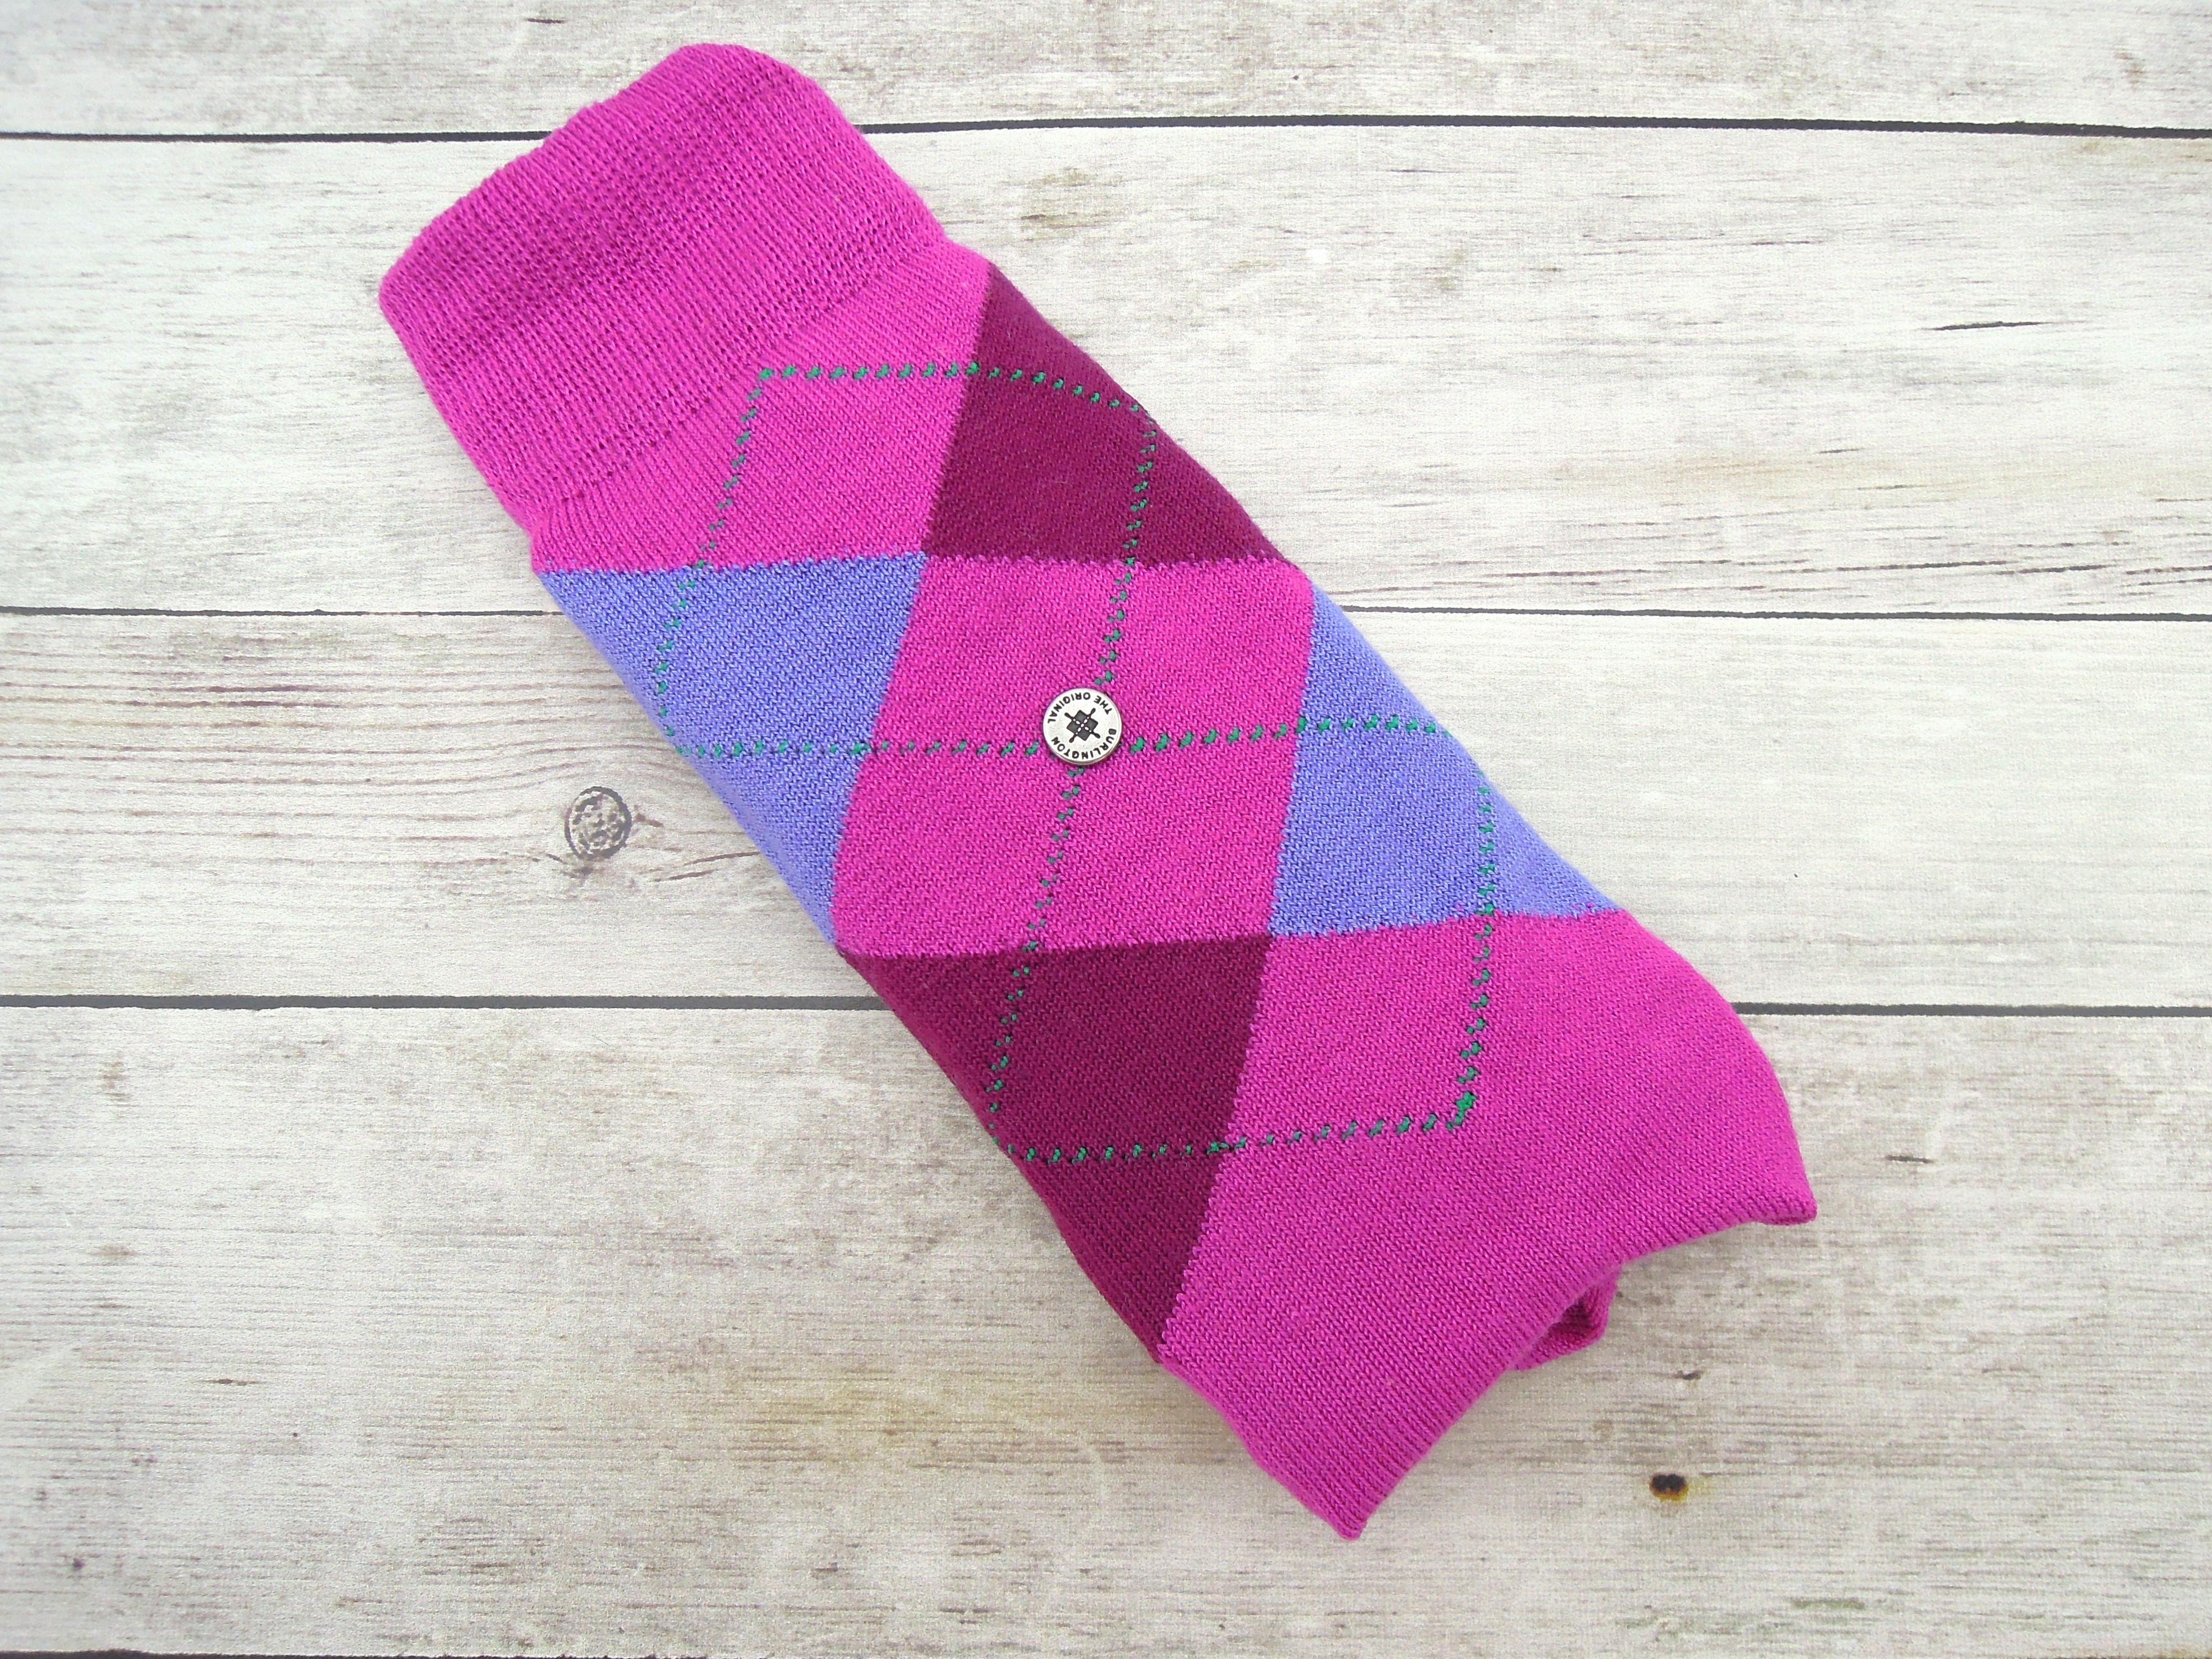 Fotos gratis : púrpura, patrón, color, Moda, rosado, textil, vestir ...